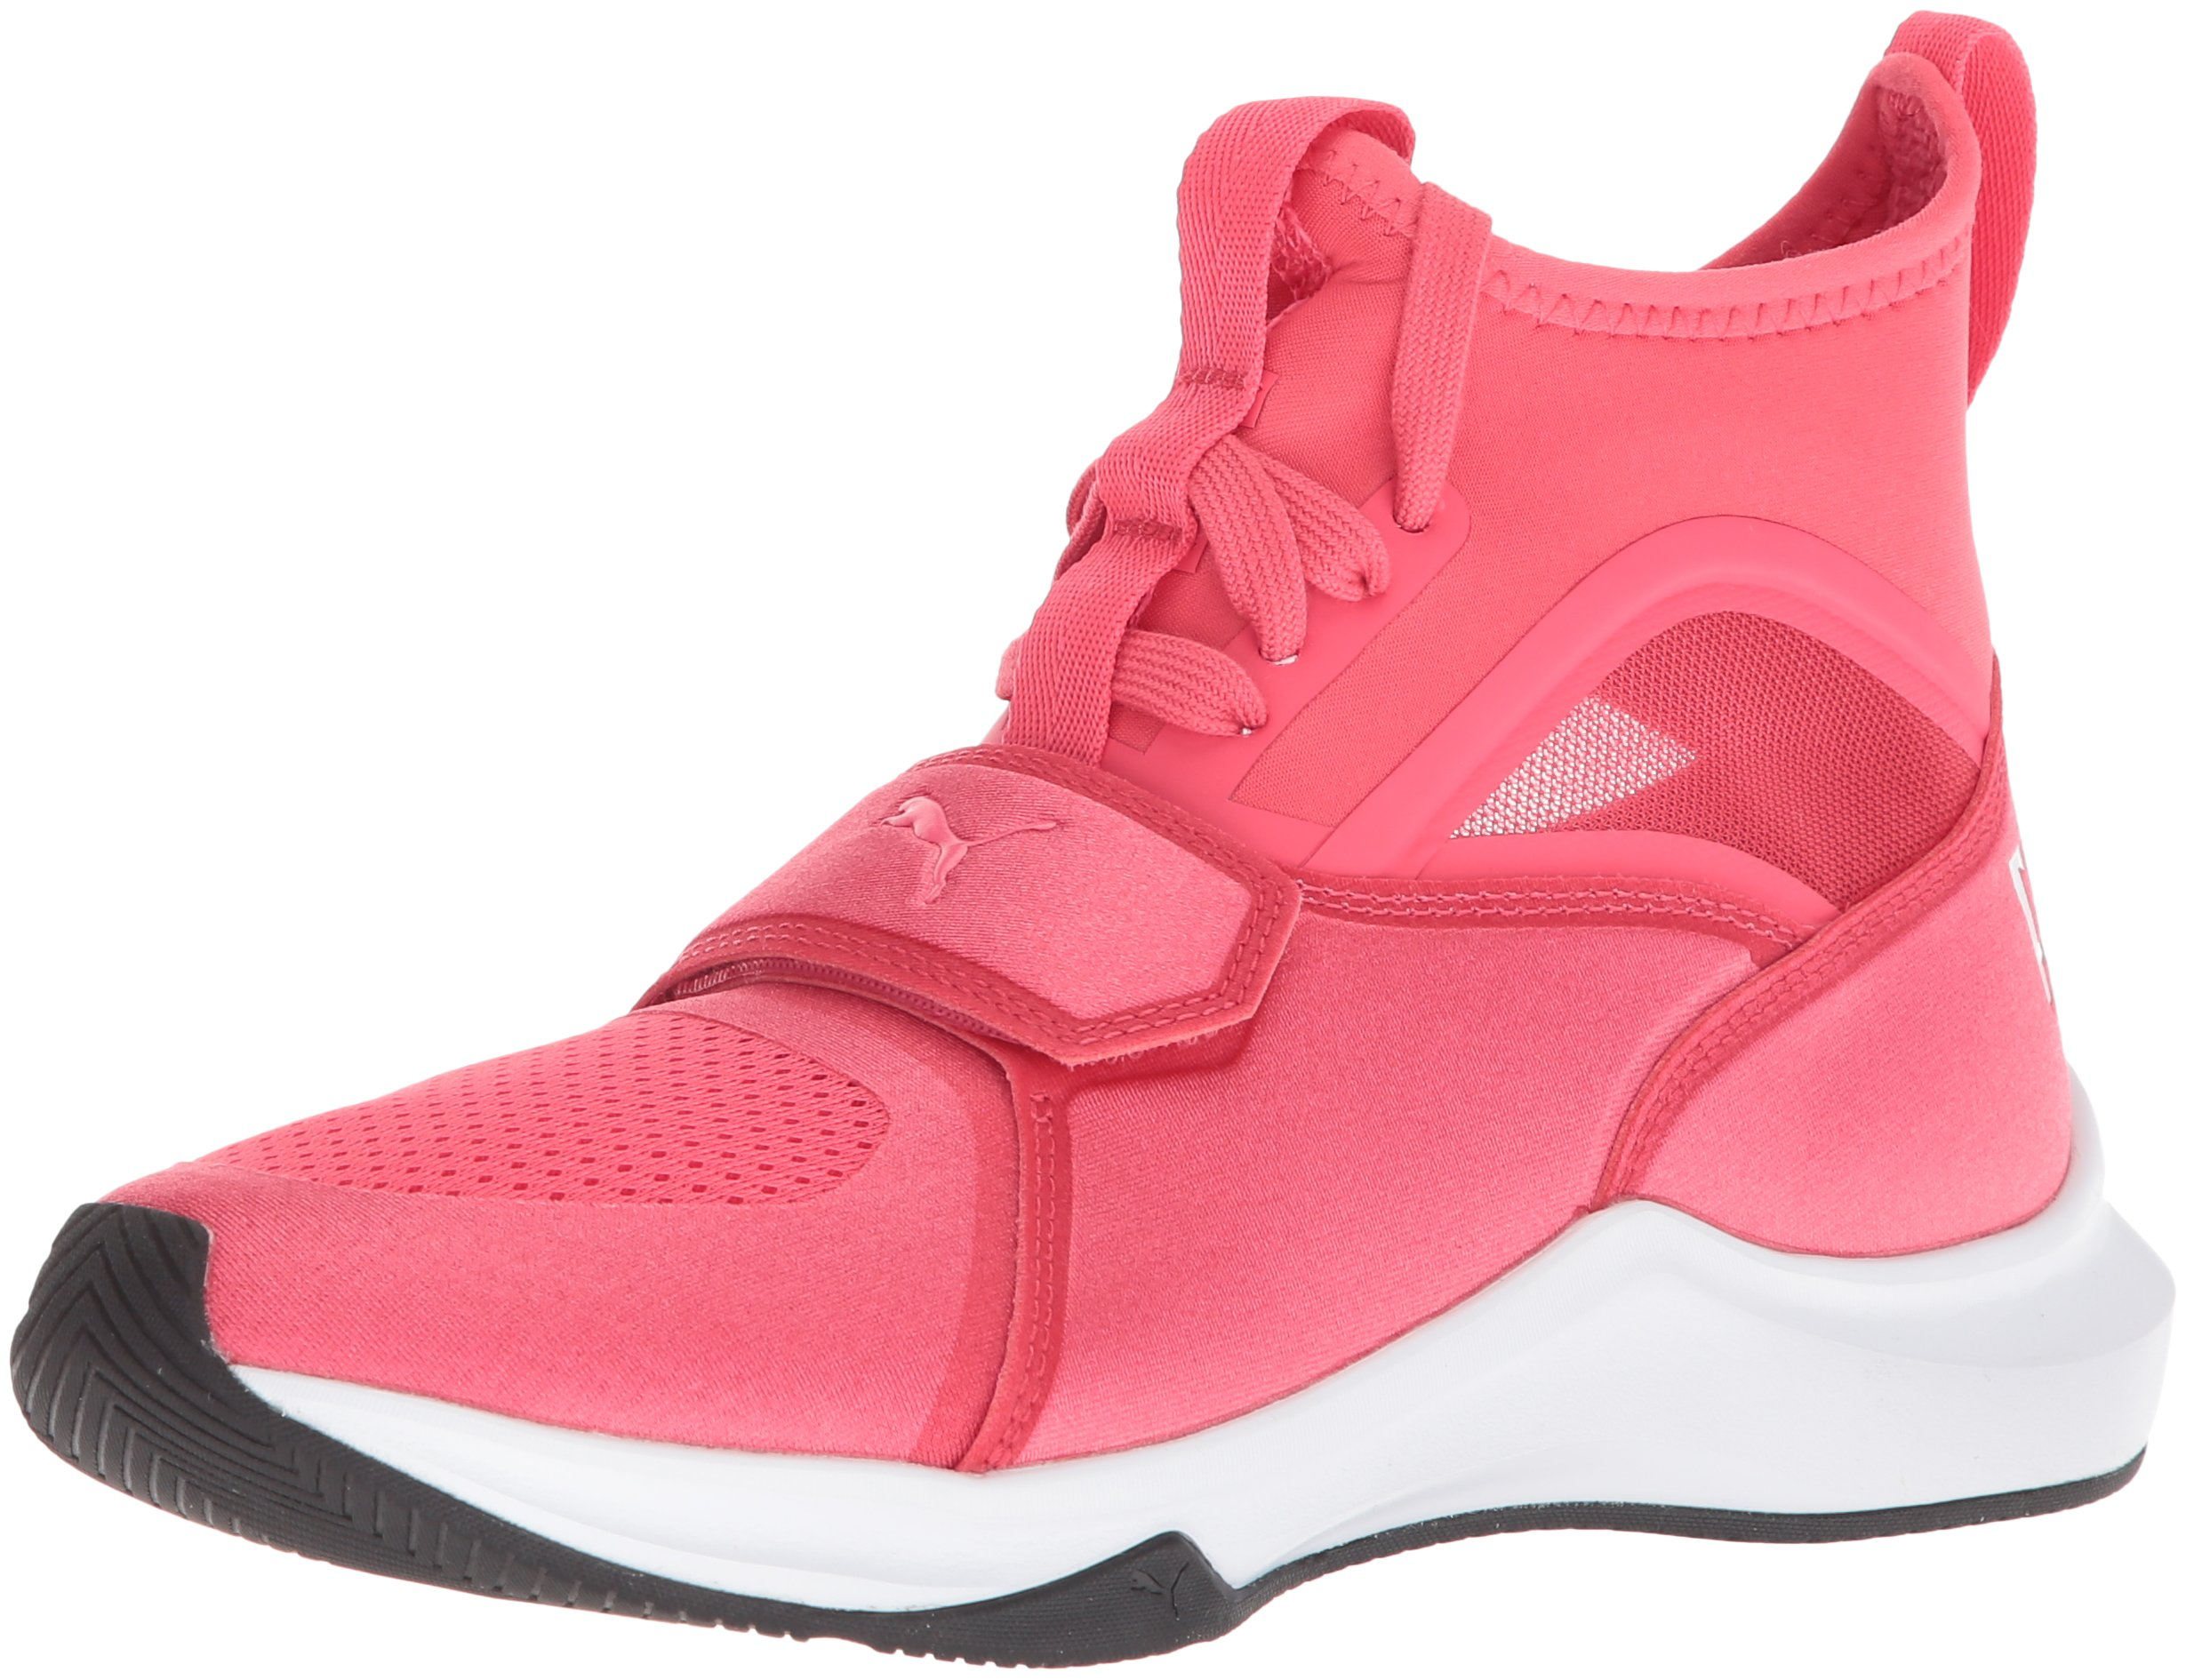 PUMA Women's Phenom Wn Sneaker, Paradise Pink White, 9 M US